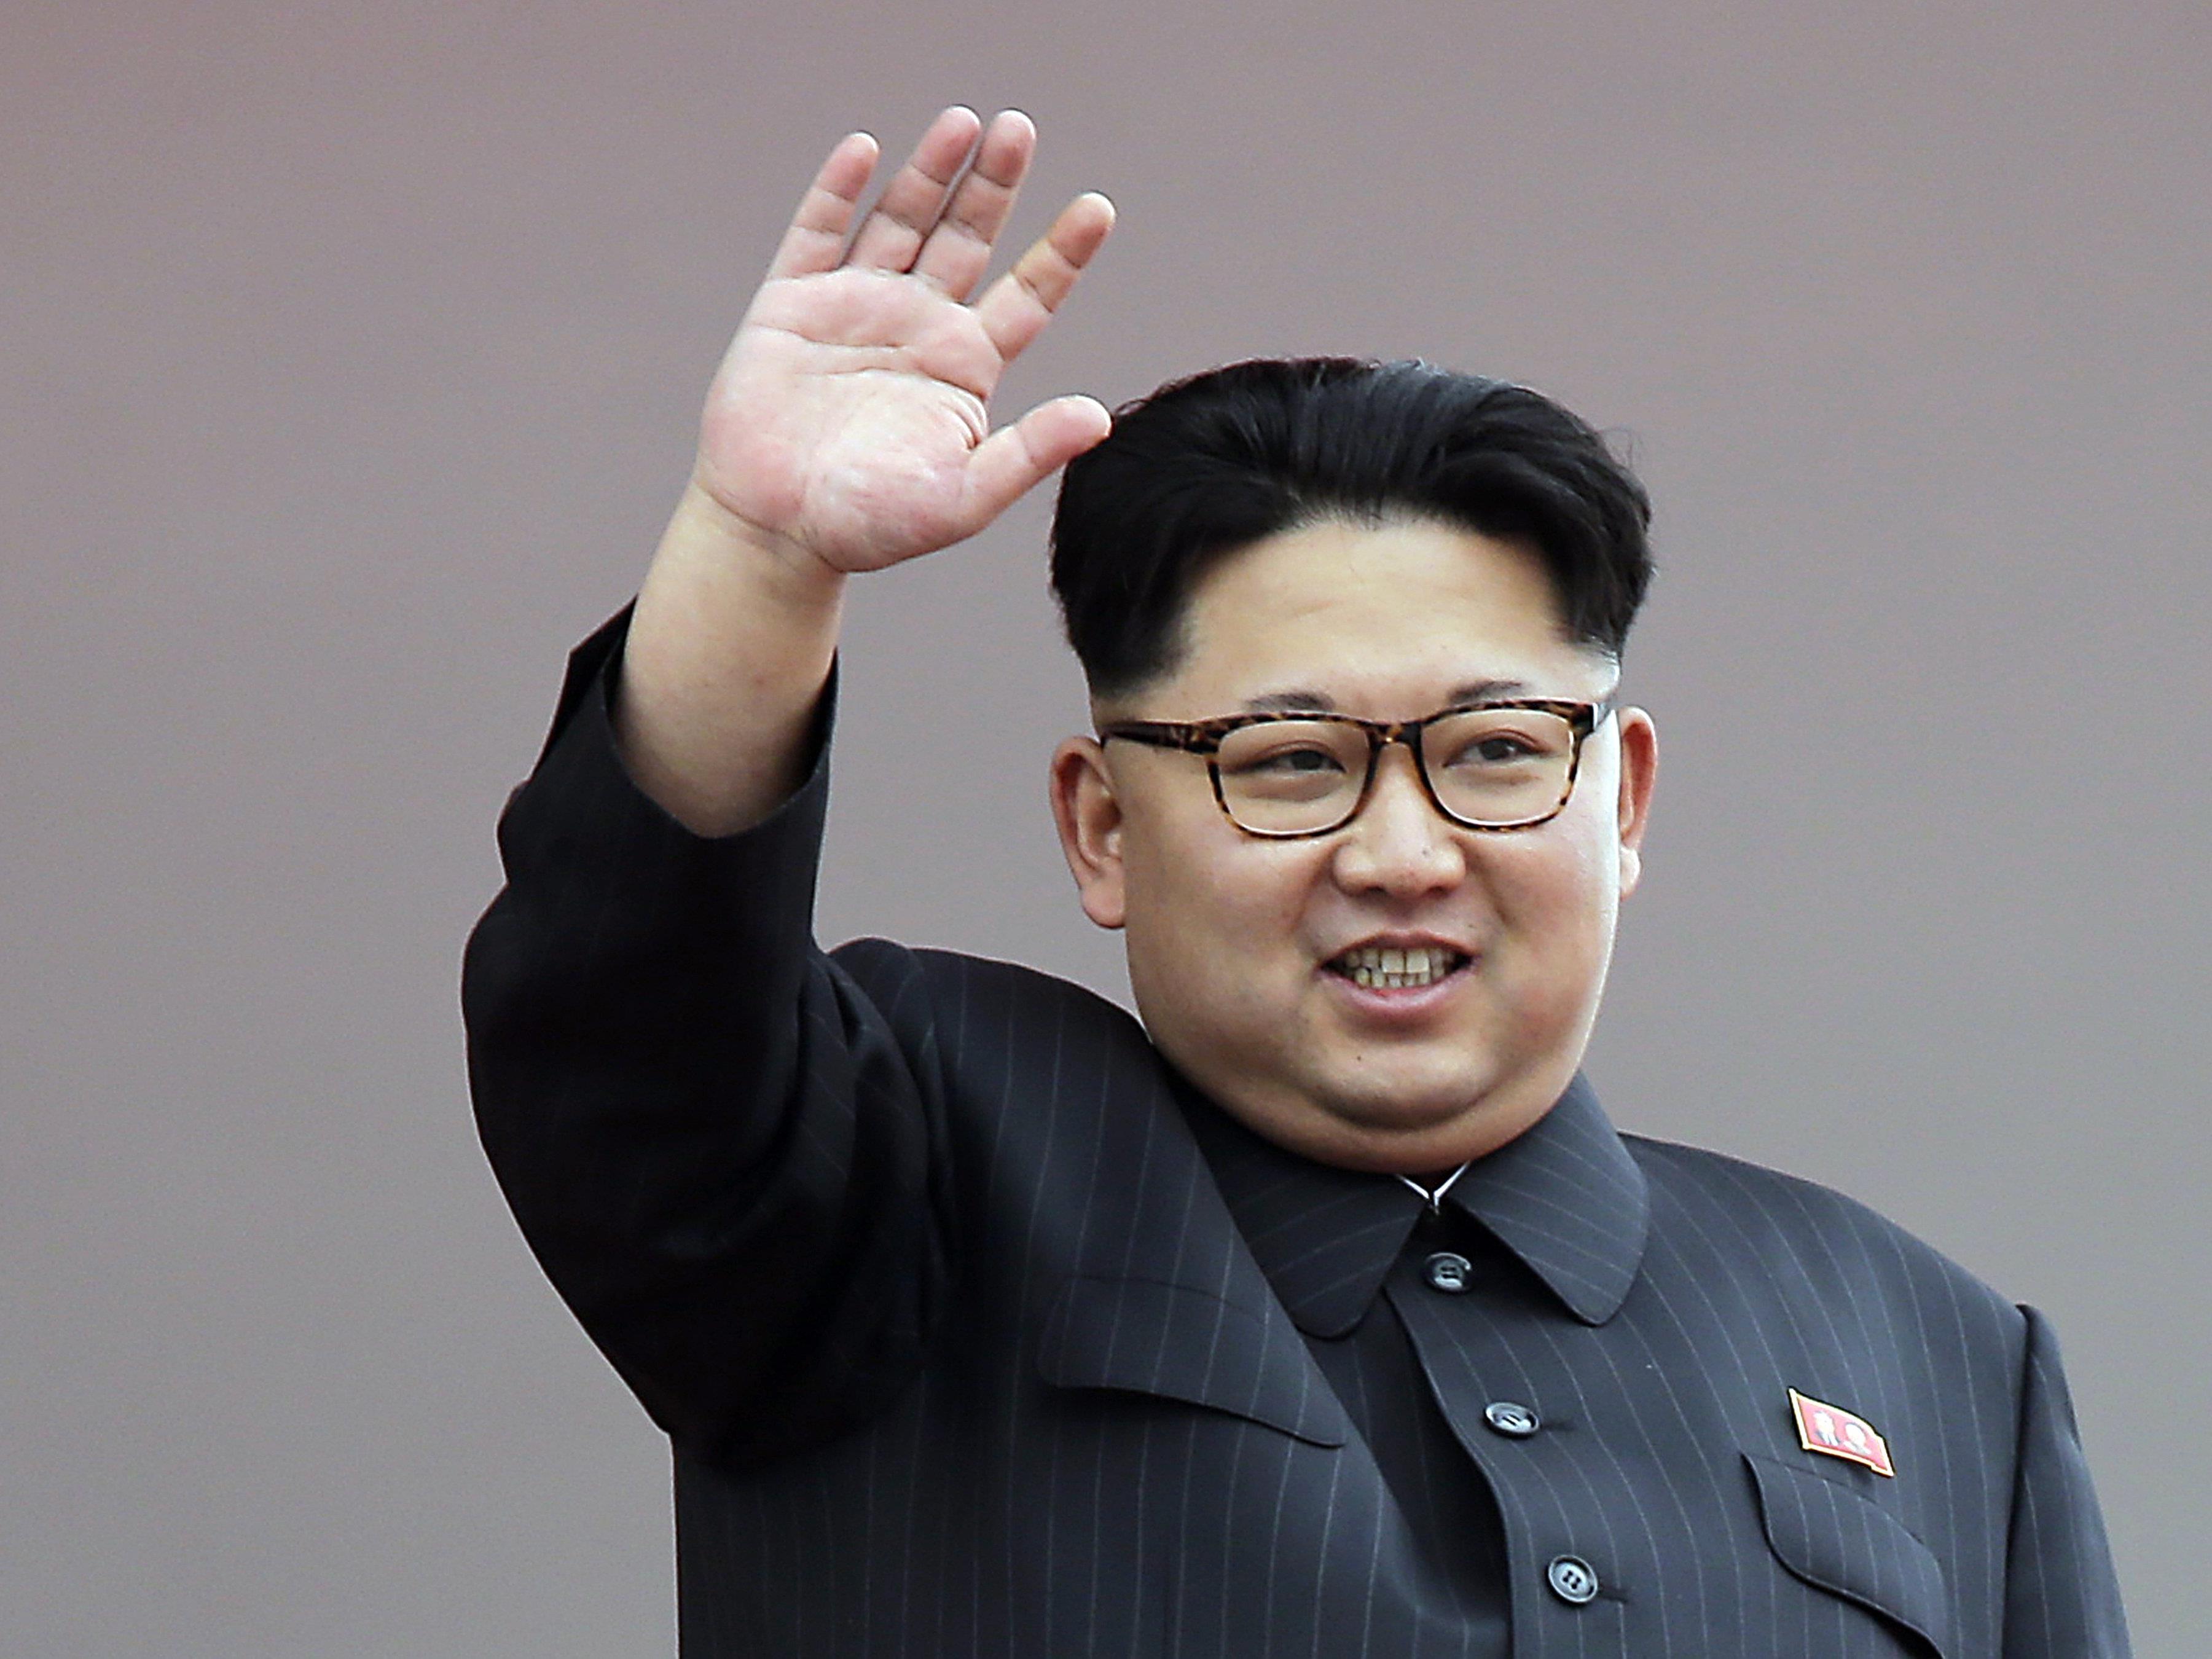 Kim Jong-un zensiert ordentlich im nordkoreanichen Internet.